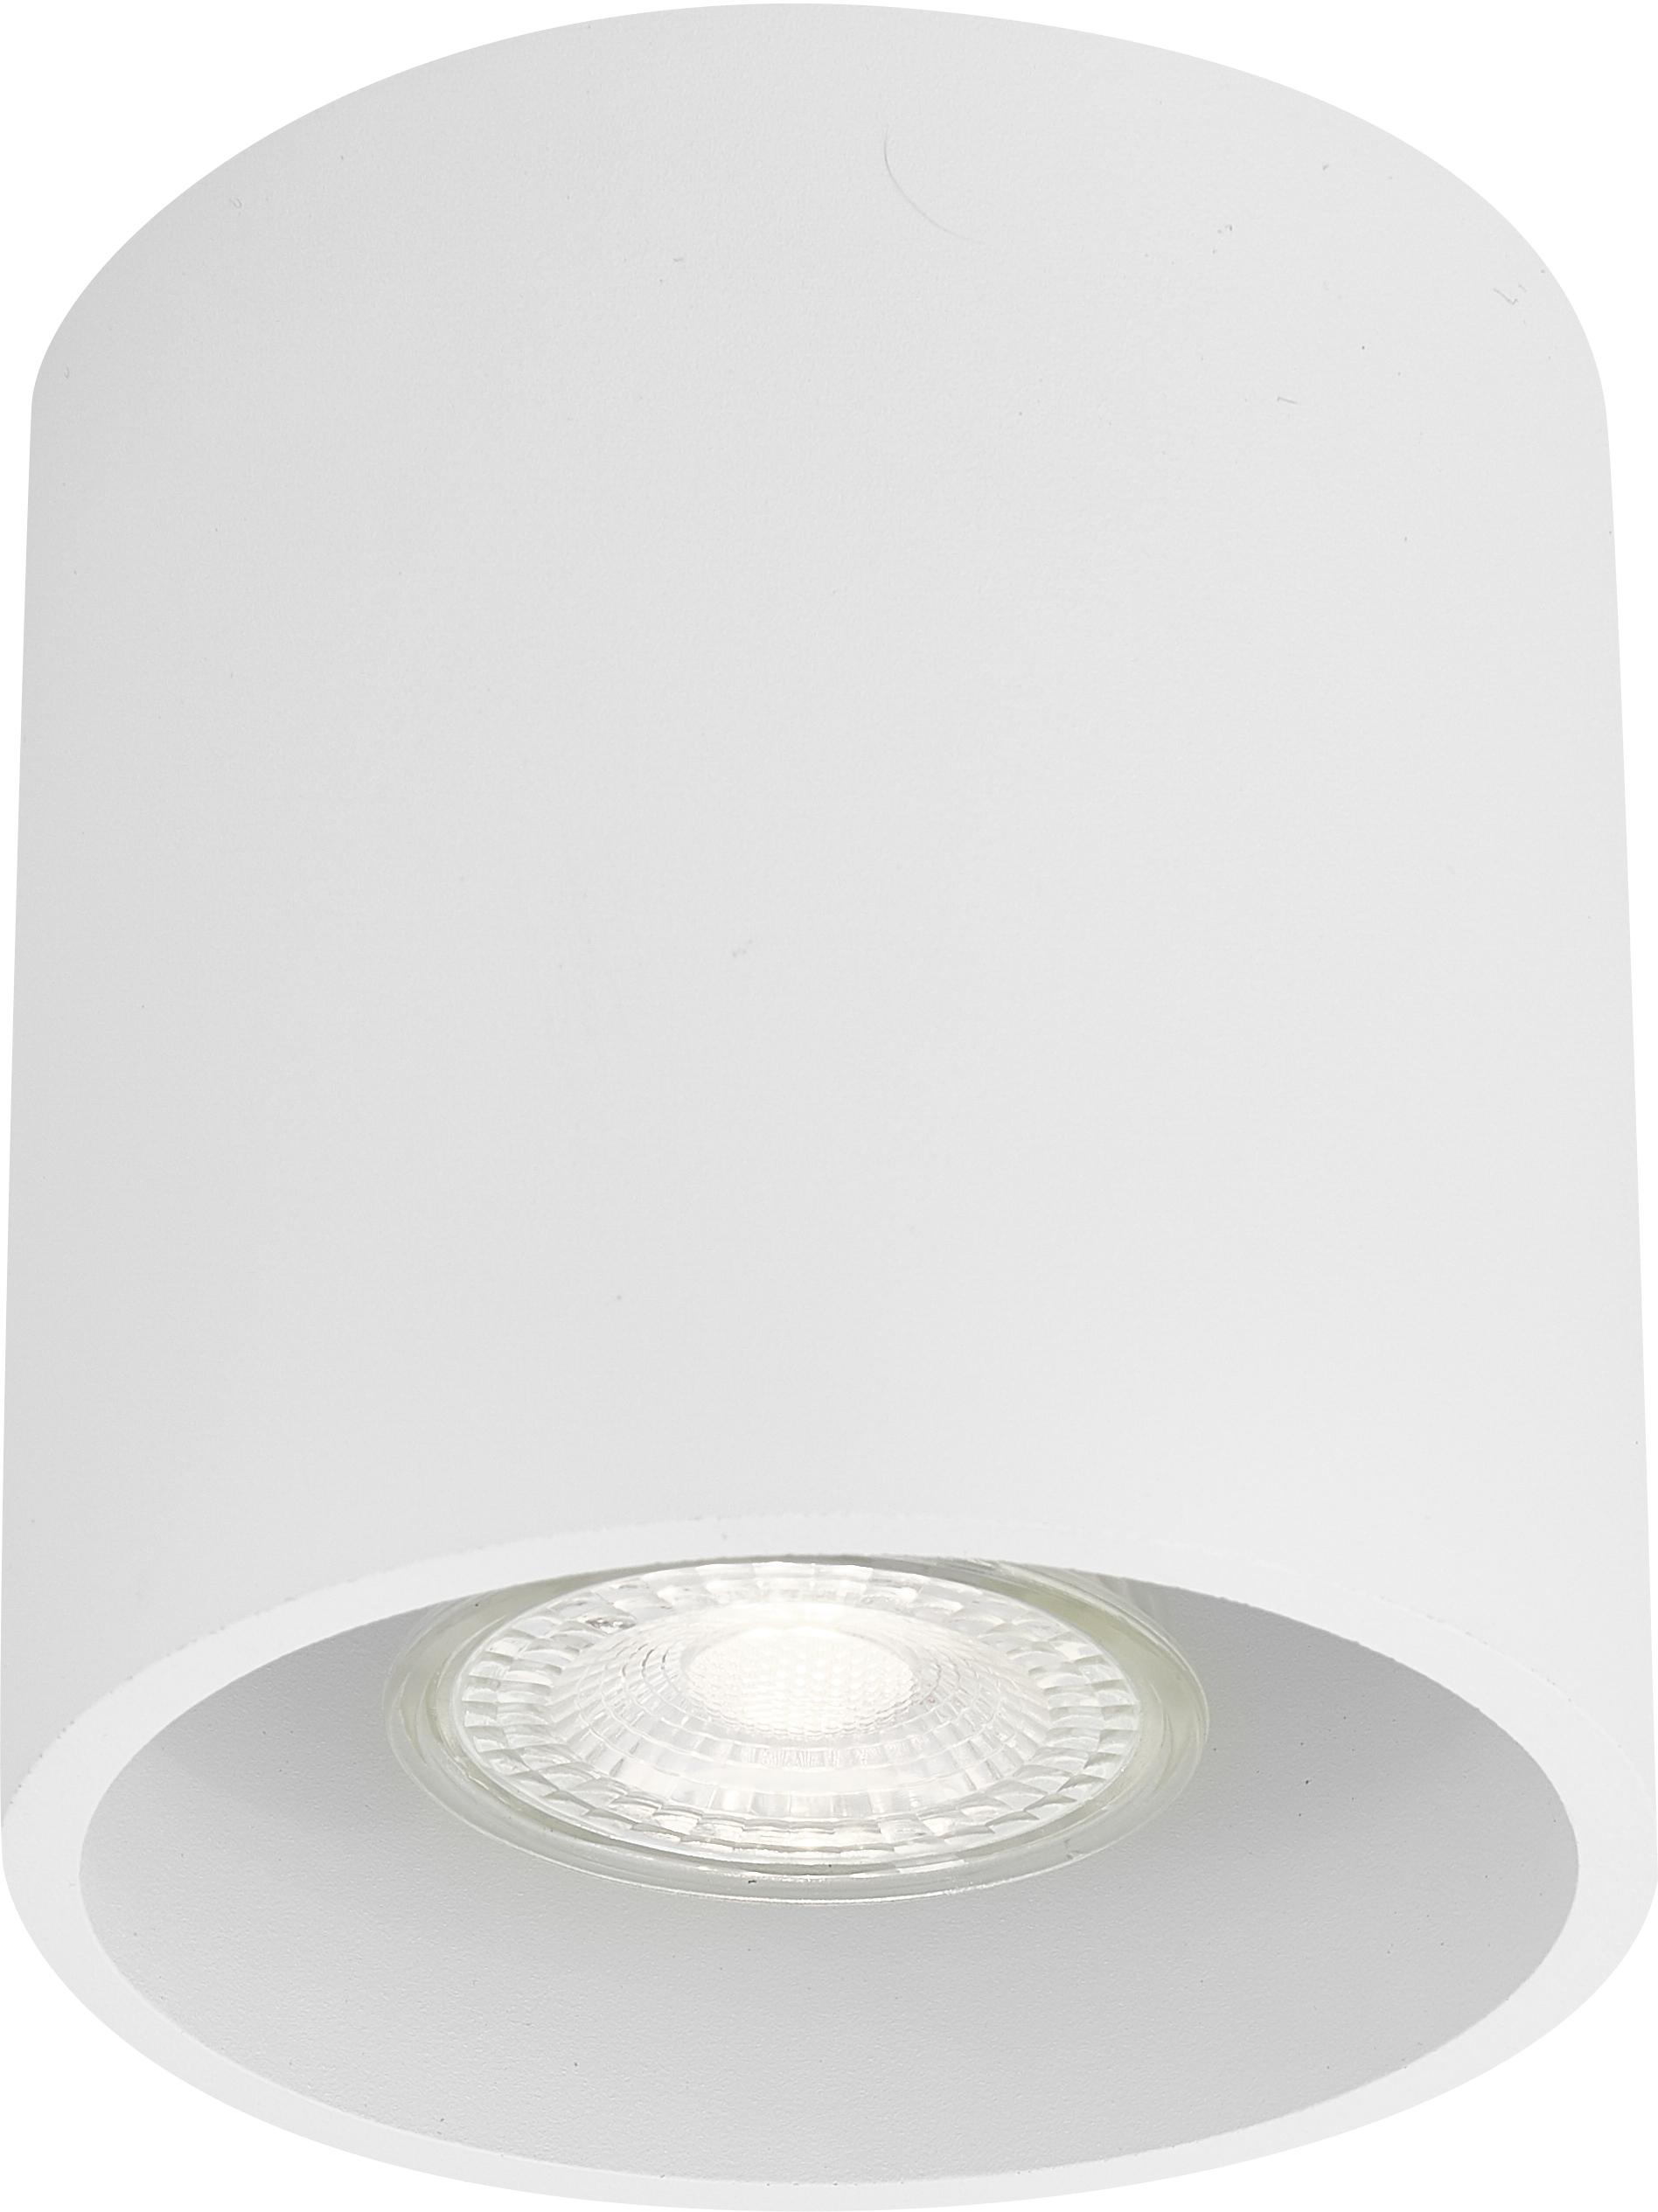 Plafondspot Roda in wit, Gecoat aluminium, Wit, Ø 10 x H 10 cm